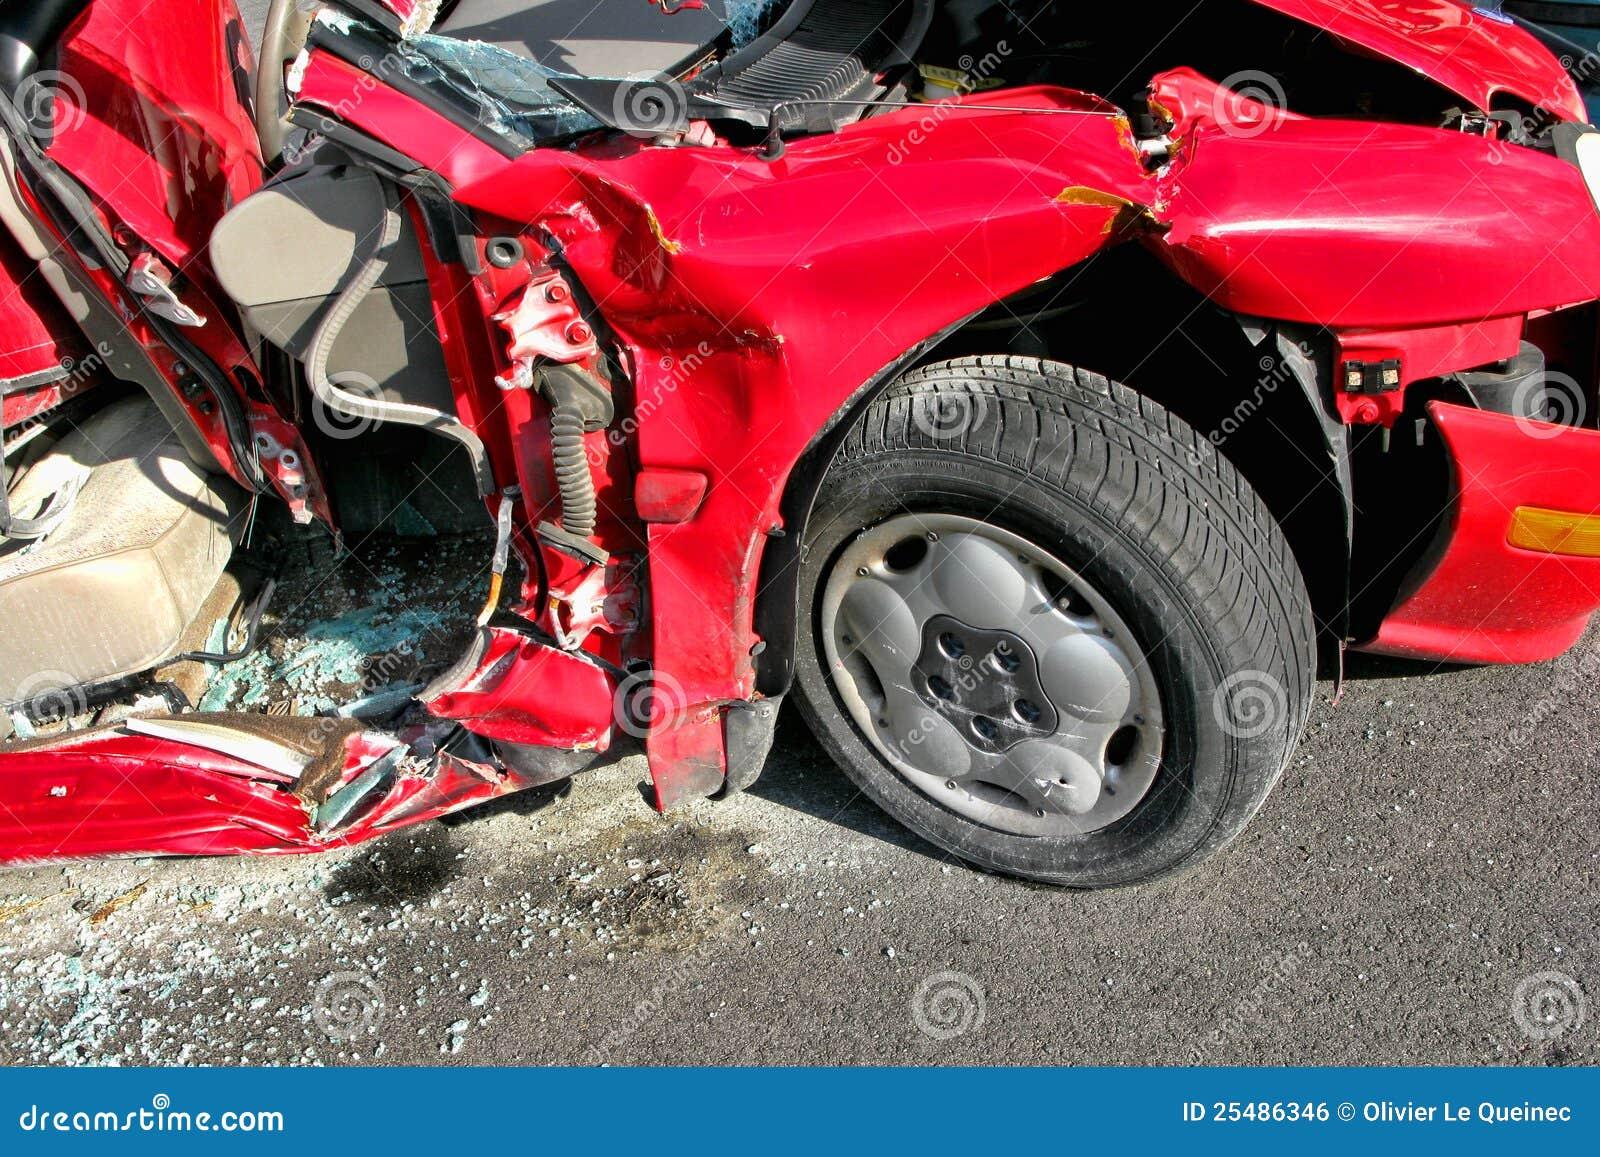 Car Wreck Demolished after Serious Crash Accident